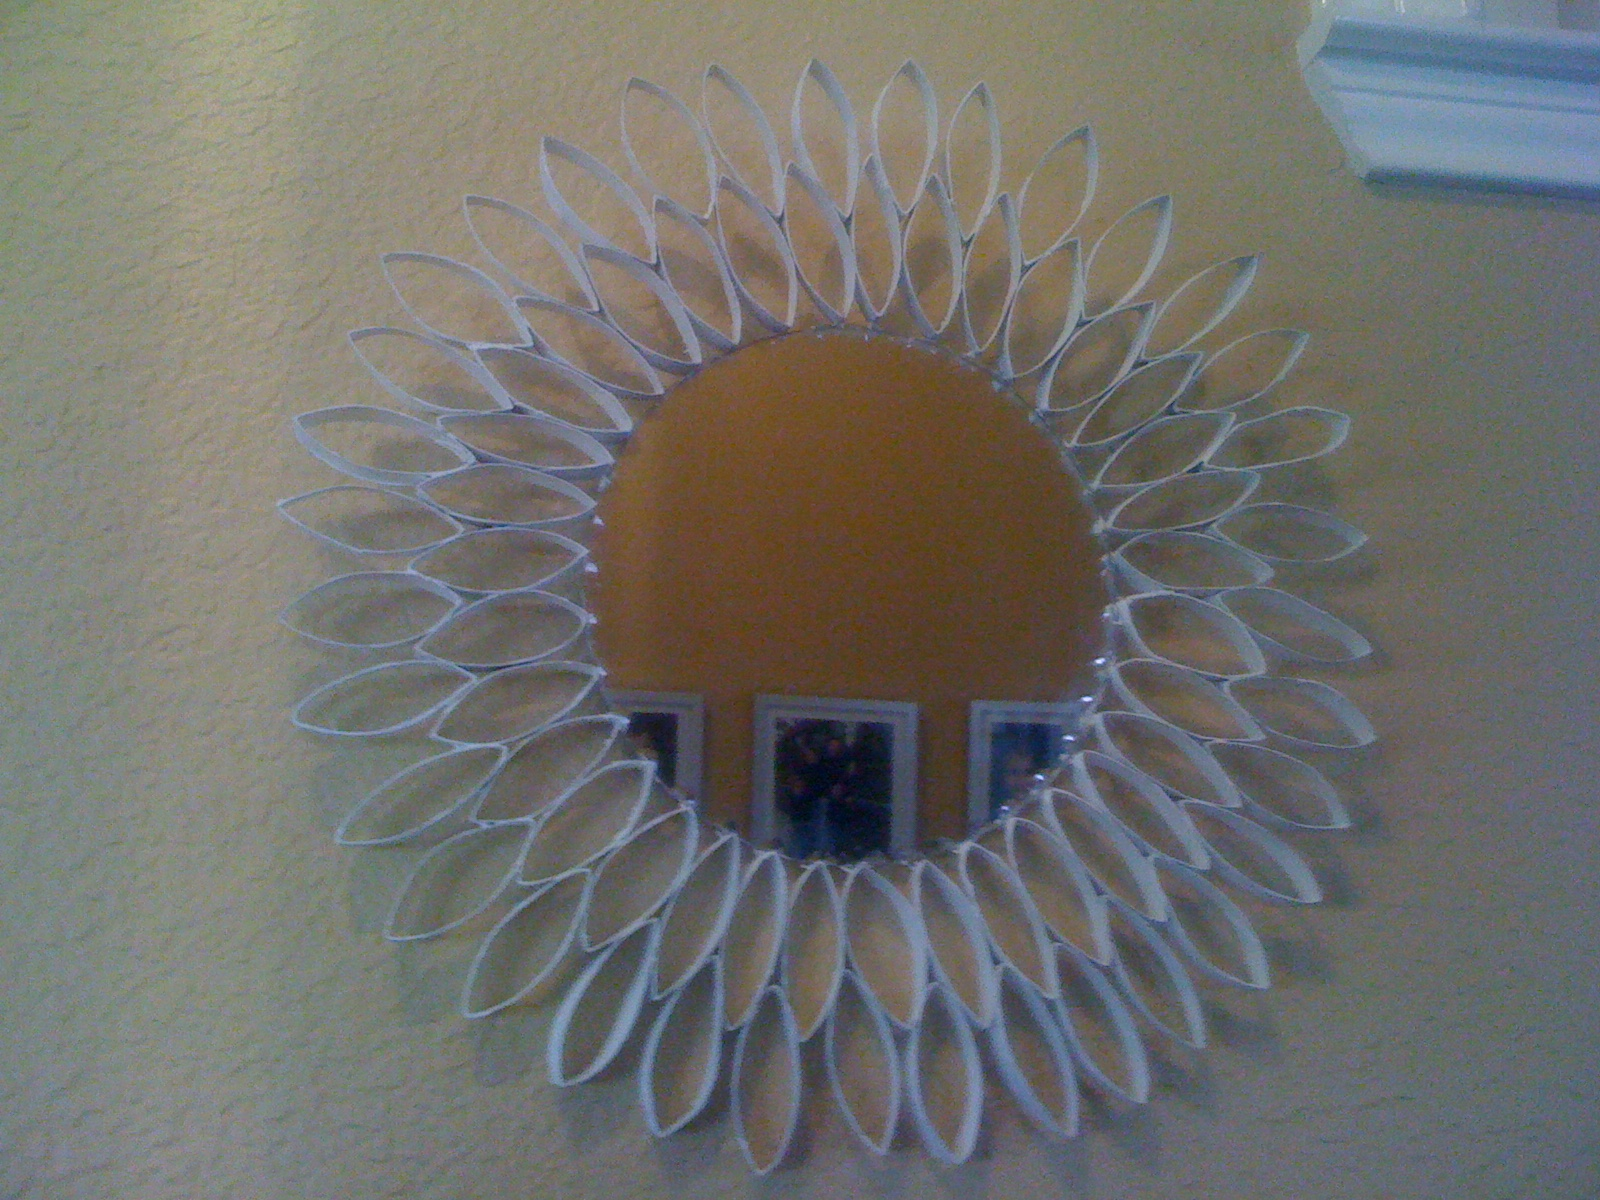 Toilette Paper Tube Mirror